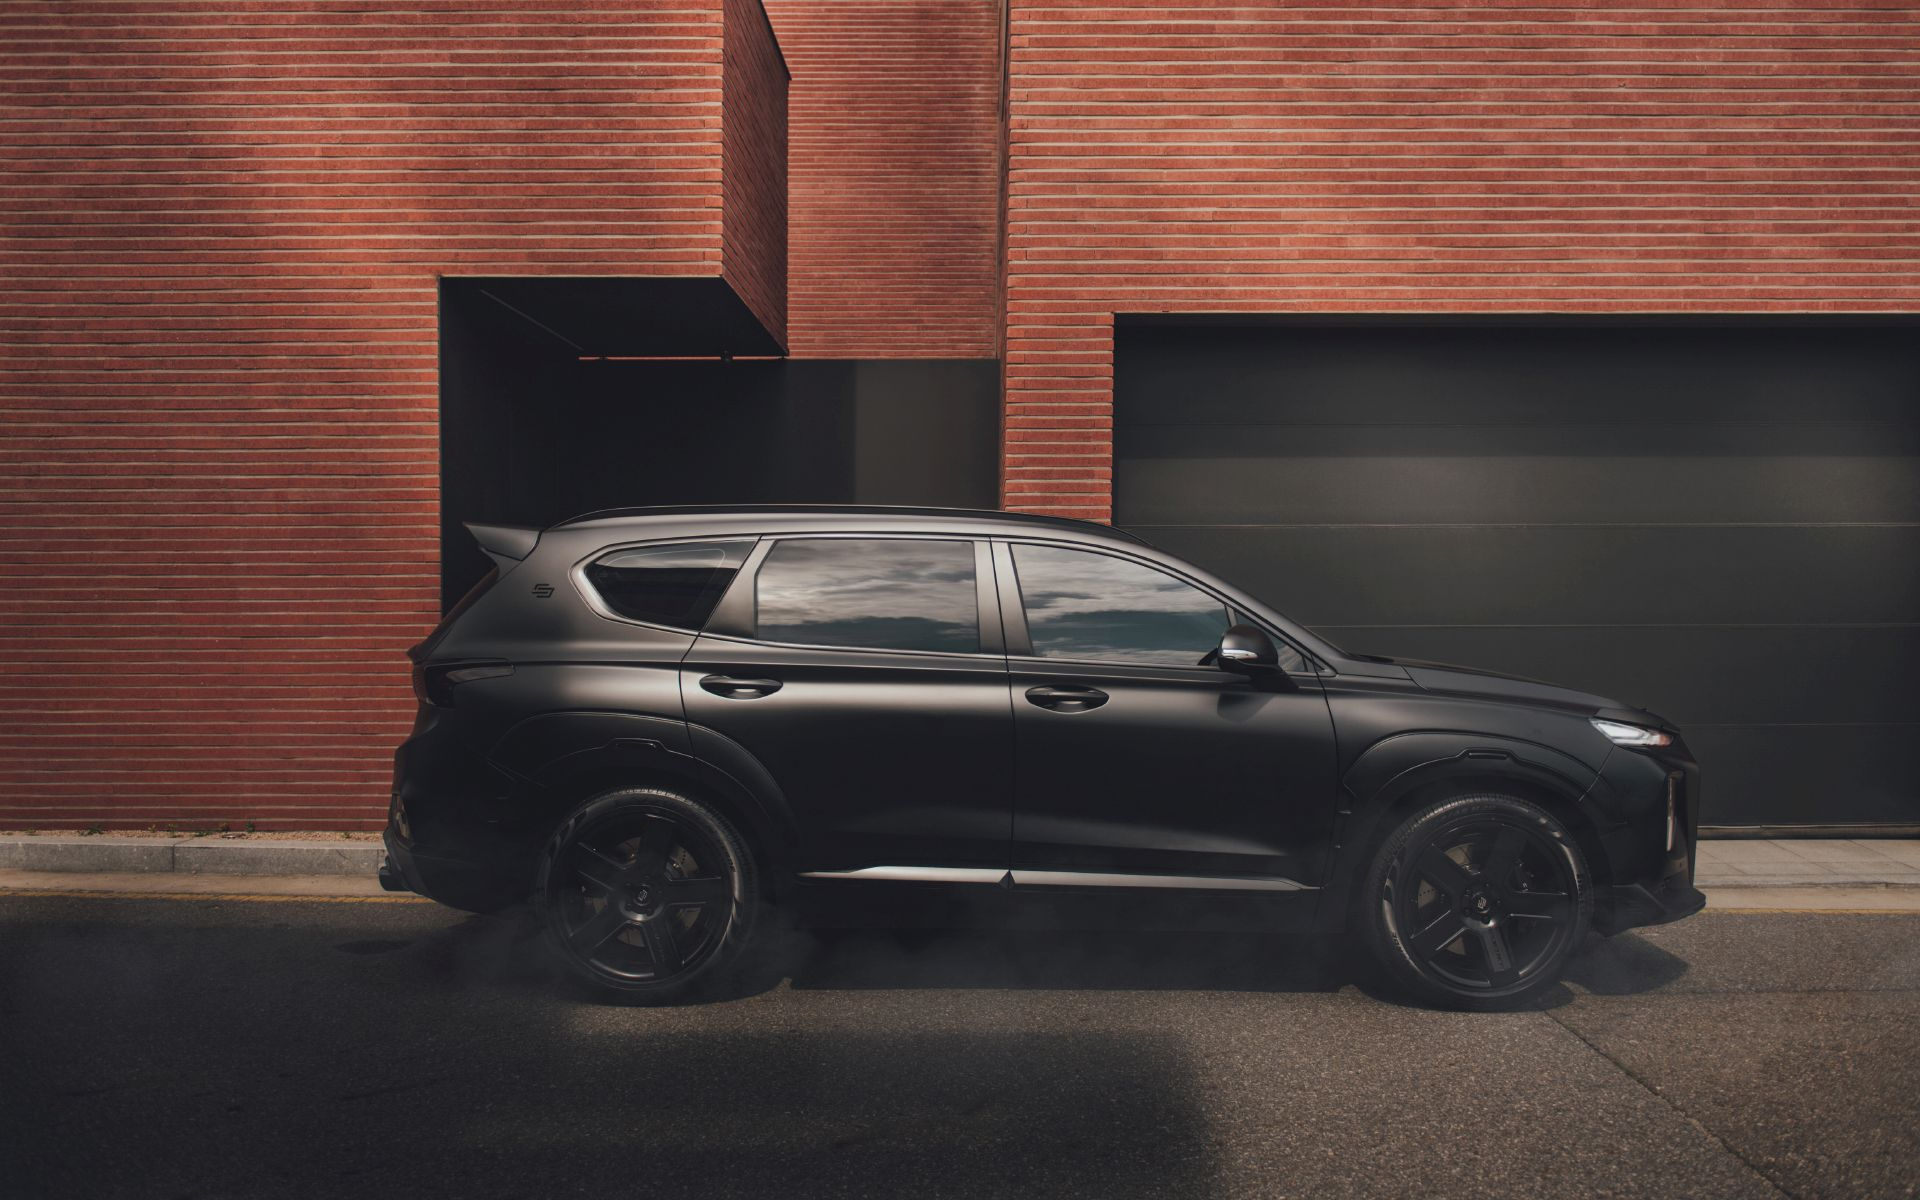 Hyundai-Santa-Fe-by-Carlex-Design-27